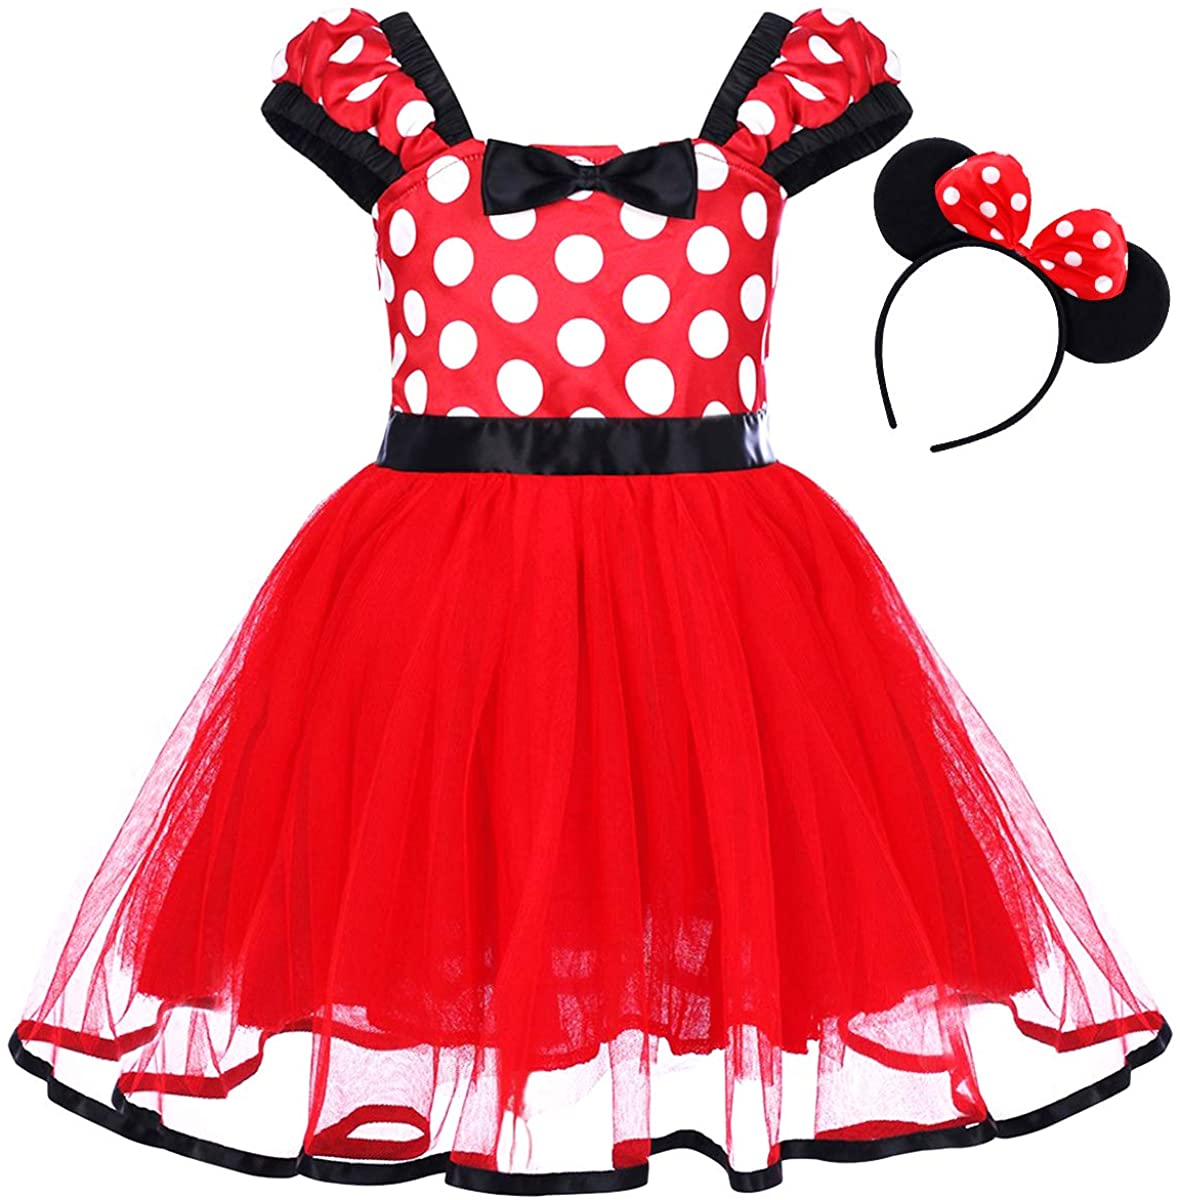 GREAMBABY Polka Dots Princess Halloween Christmas Birthday Party Costume Dress Up&Ears Headband